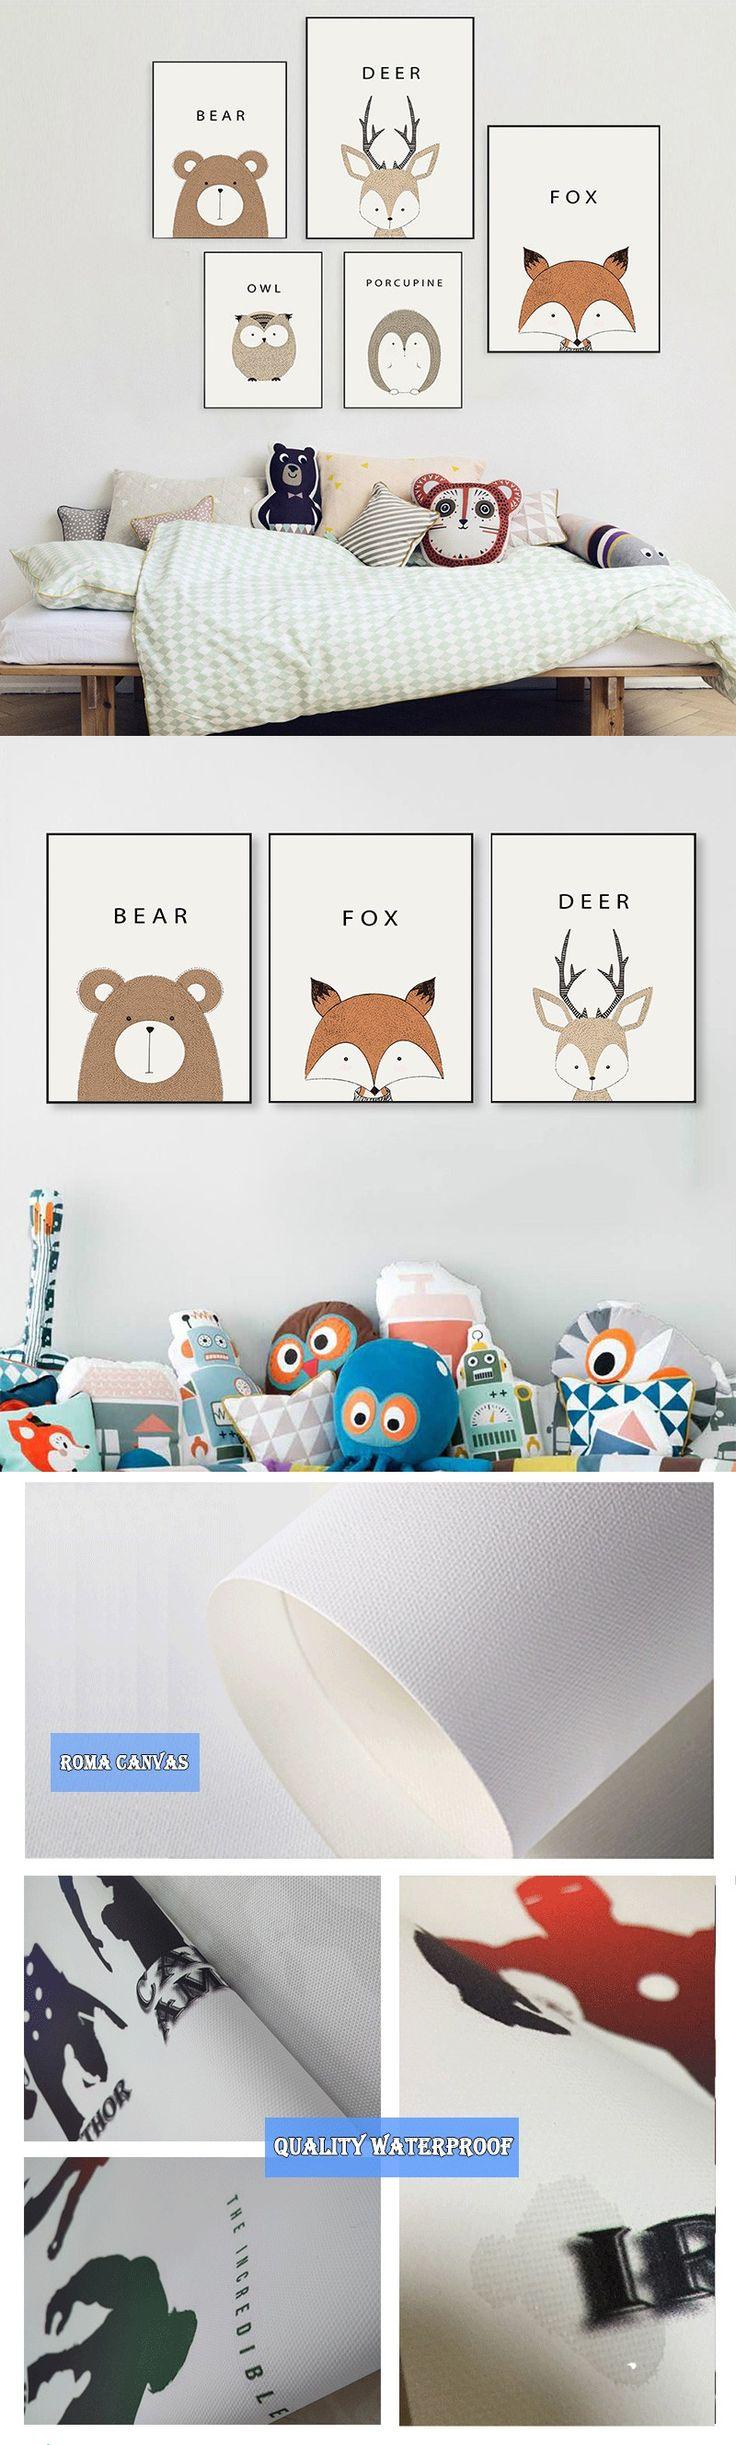 Avalisa letter upper case t stretched wall art - Cute Cartoon Animal Minimalist Art Canvas Poster Print Deer Bear Modern Nursery Picture For Modern Home Kids Room Decor 035